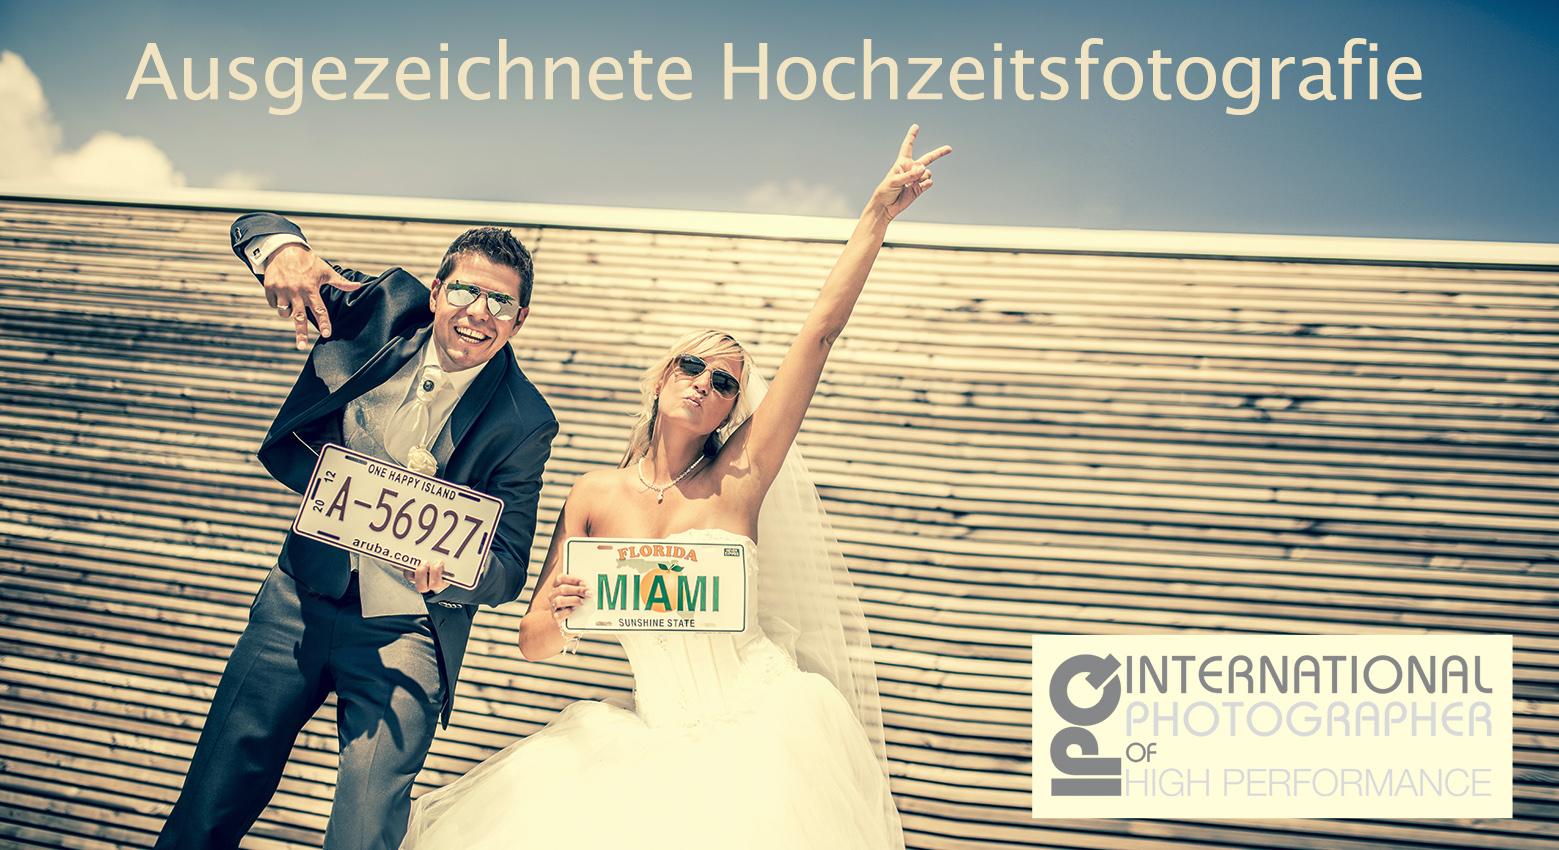 AFTER-WEDDING-eschweiler-brautpaarsshooting-aachen-hochzeitsfotos-dueren-fotos-by-domi-hochzeitsfotograf-eschweiler-12781291